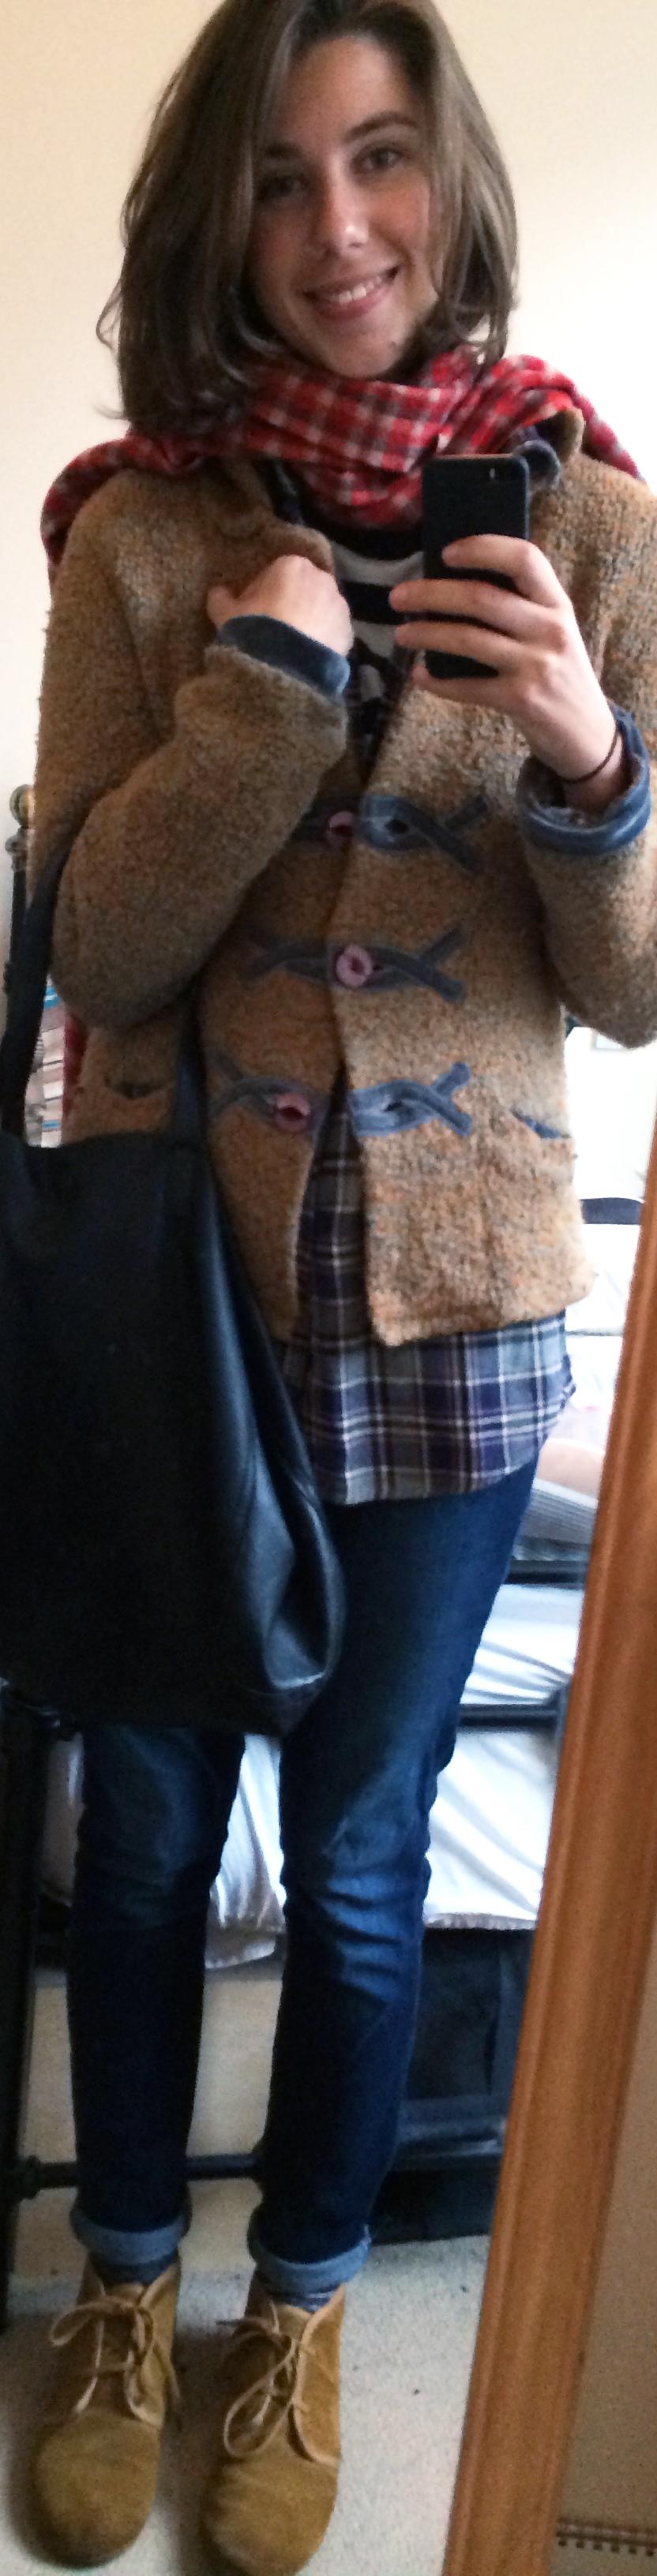 Straight Leg Jeans ,  Flannel Shirt ,  Plaid Scarf ,  Cardigan ,  Desert Boots ,  Black Leather Handbag